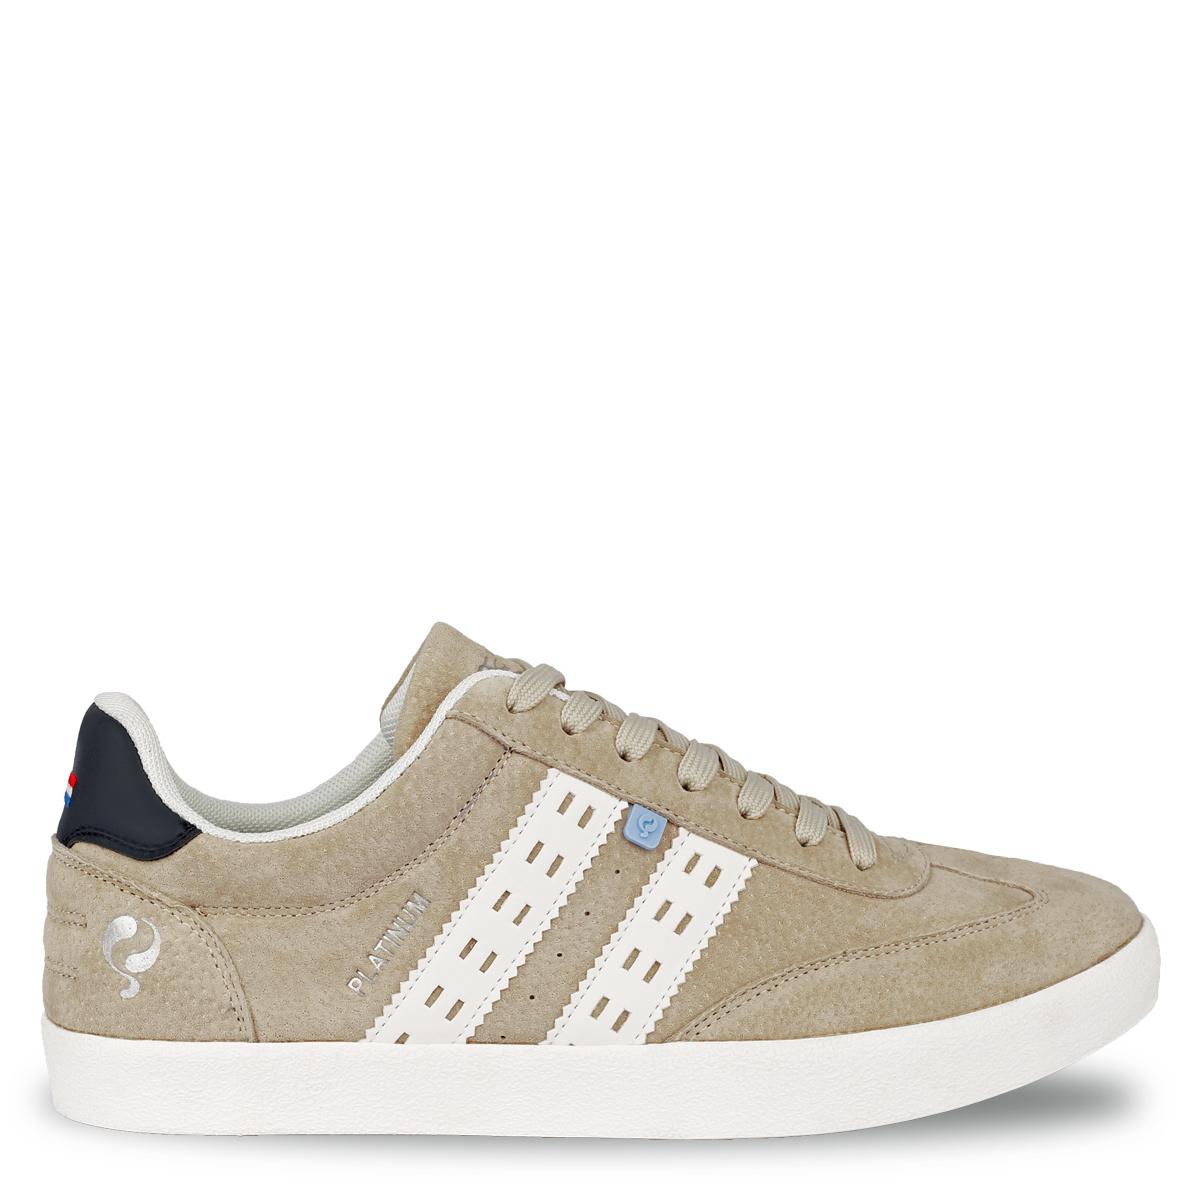 Mix & Match: 2 voor 119 - Heren Sneaker Platinum - Zacht Taupe/Wit/Donkerblauw